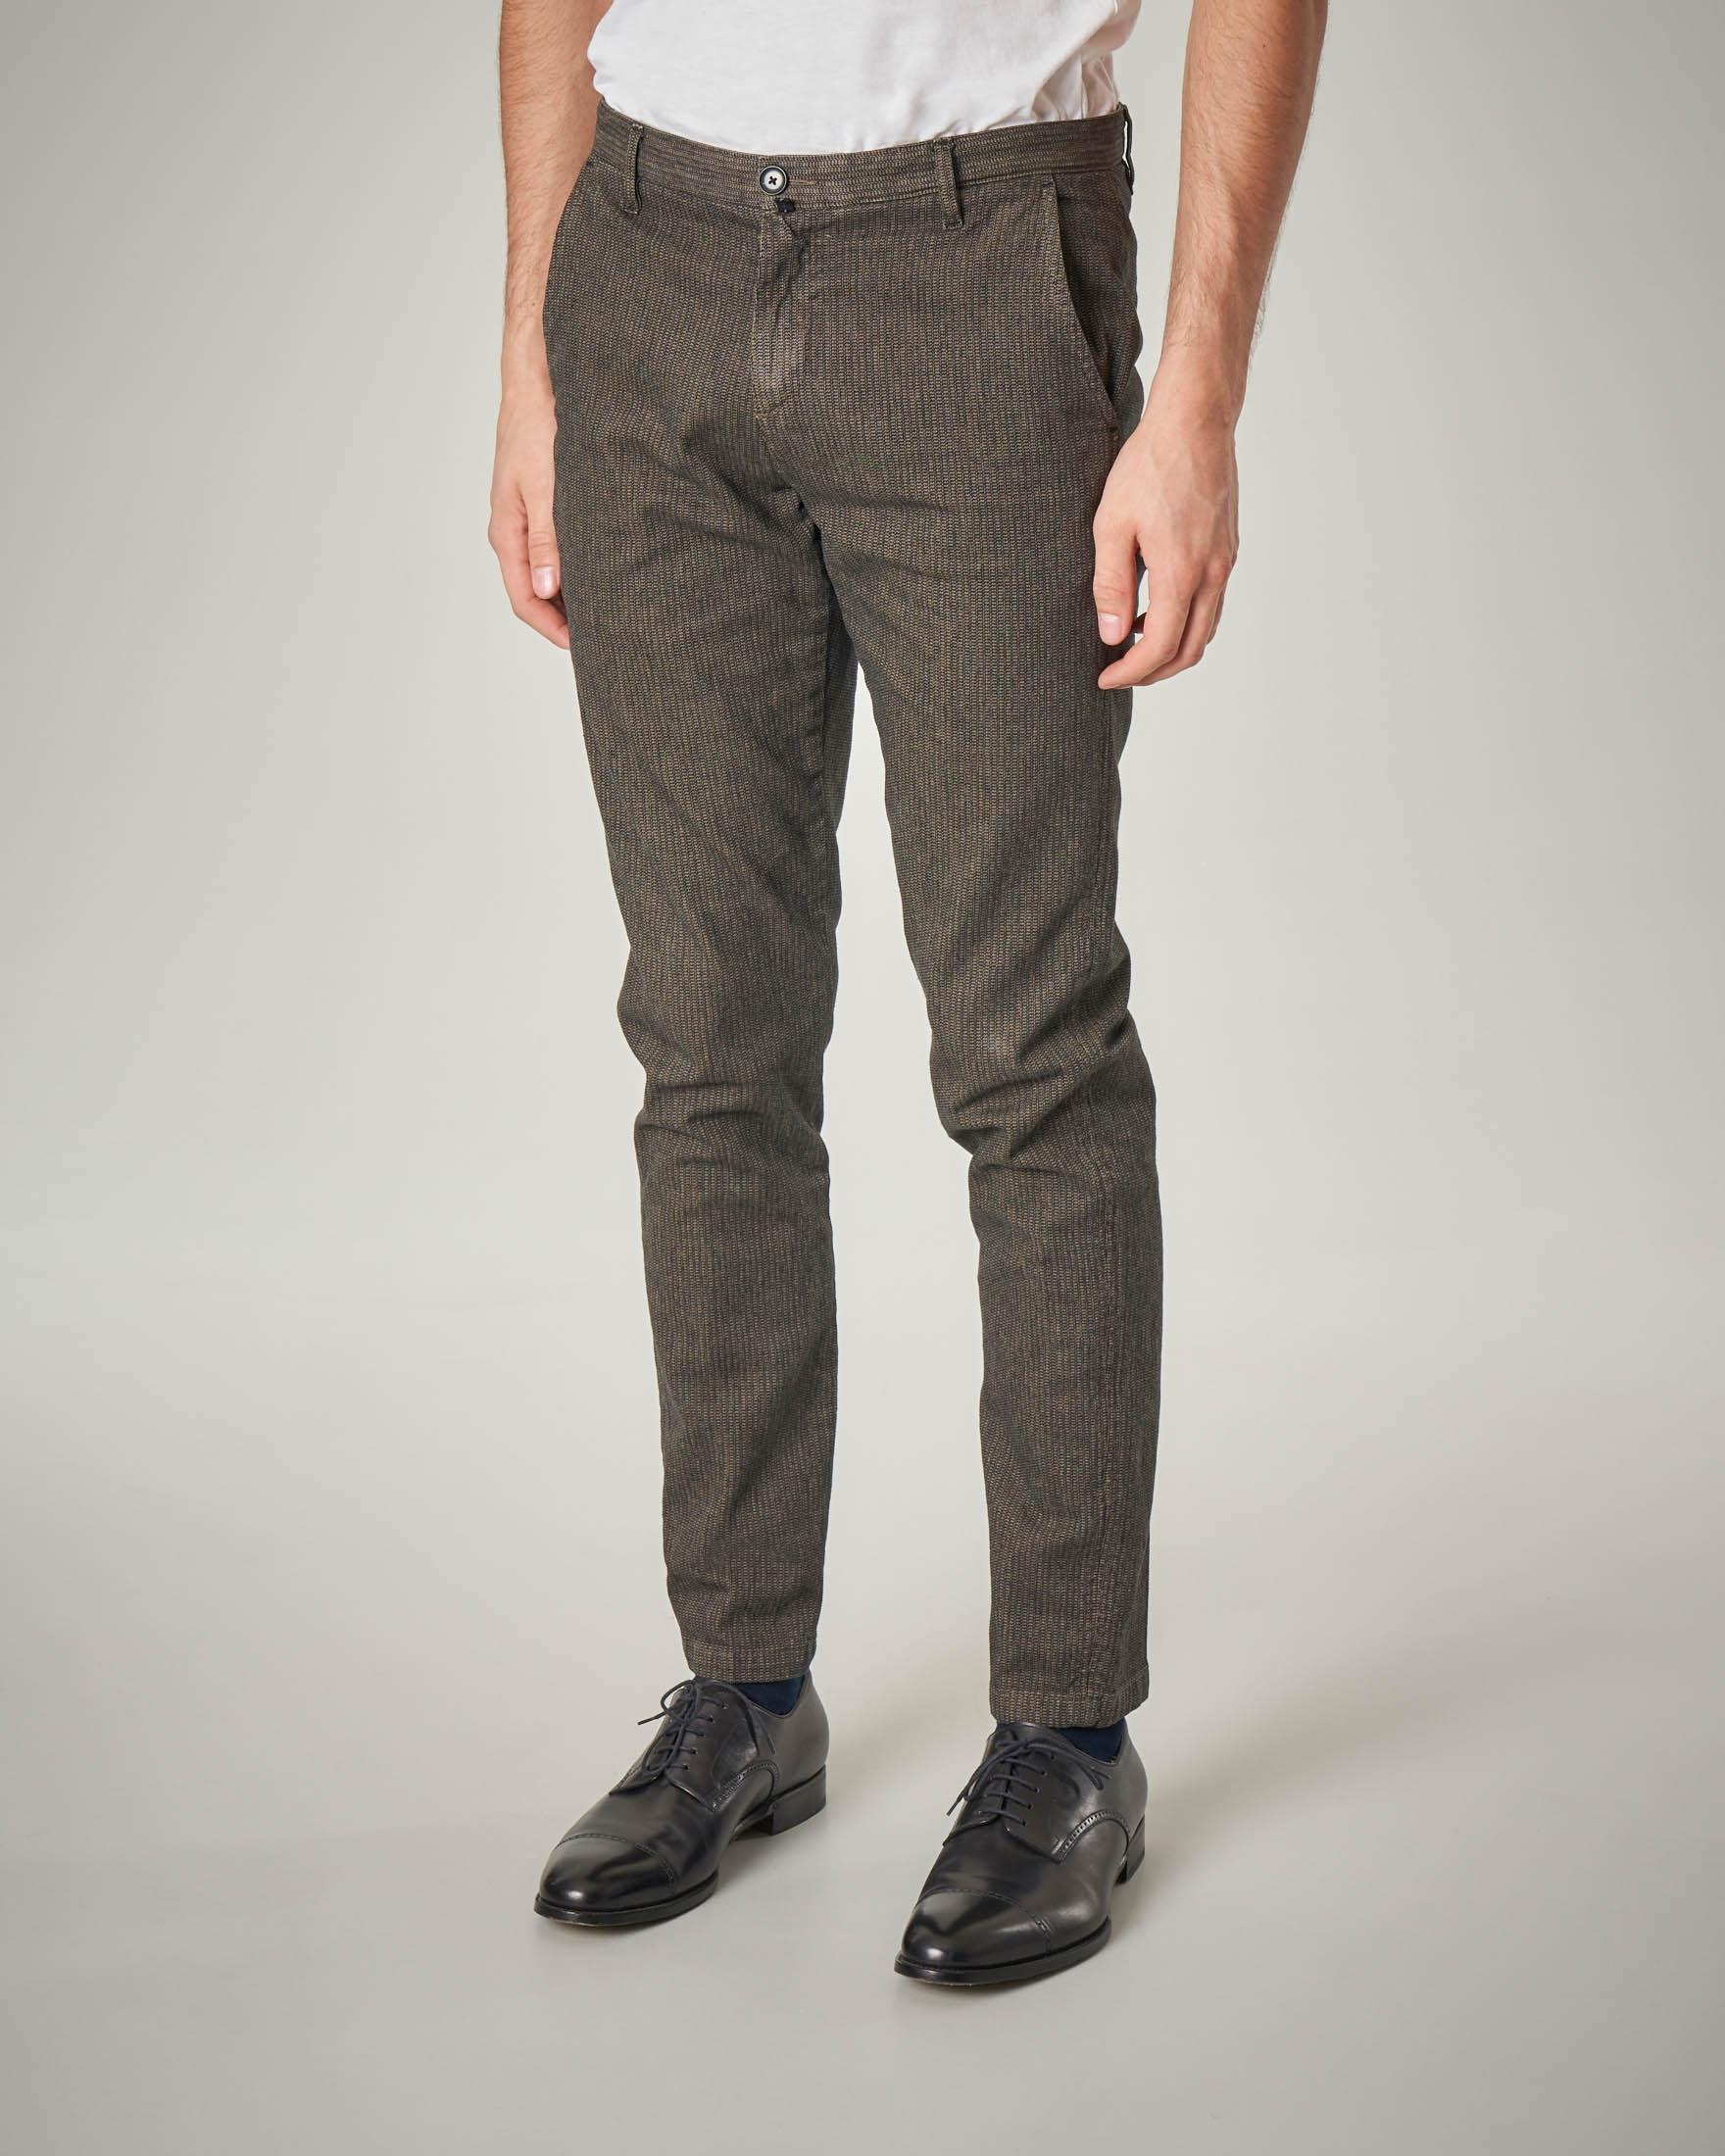 Pantalone chino tortora micro-armatura